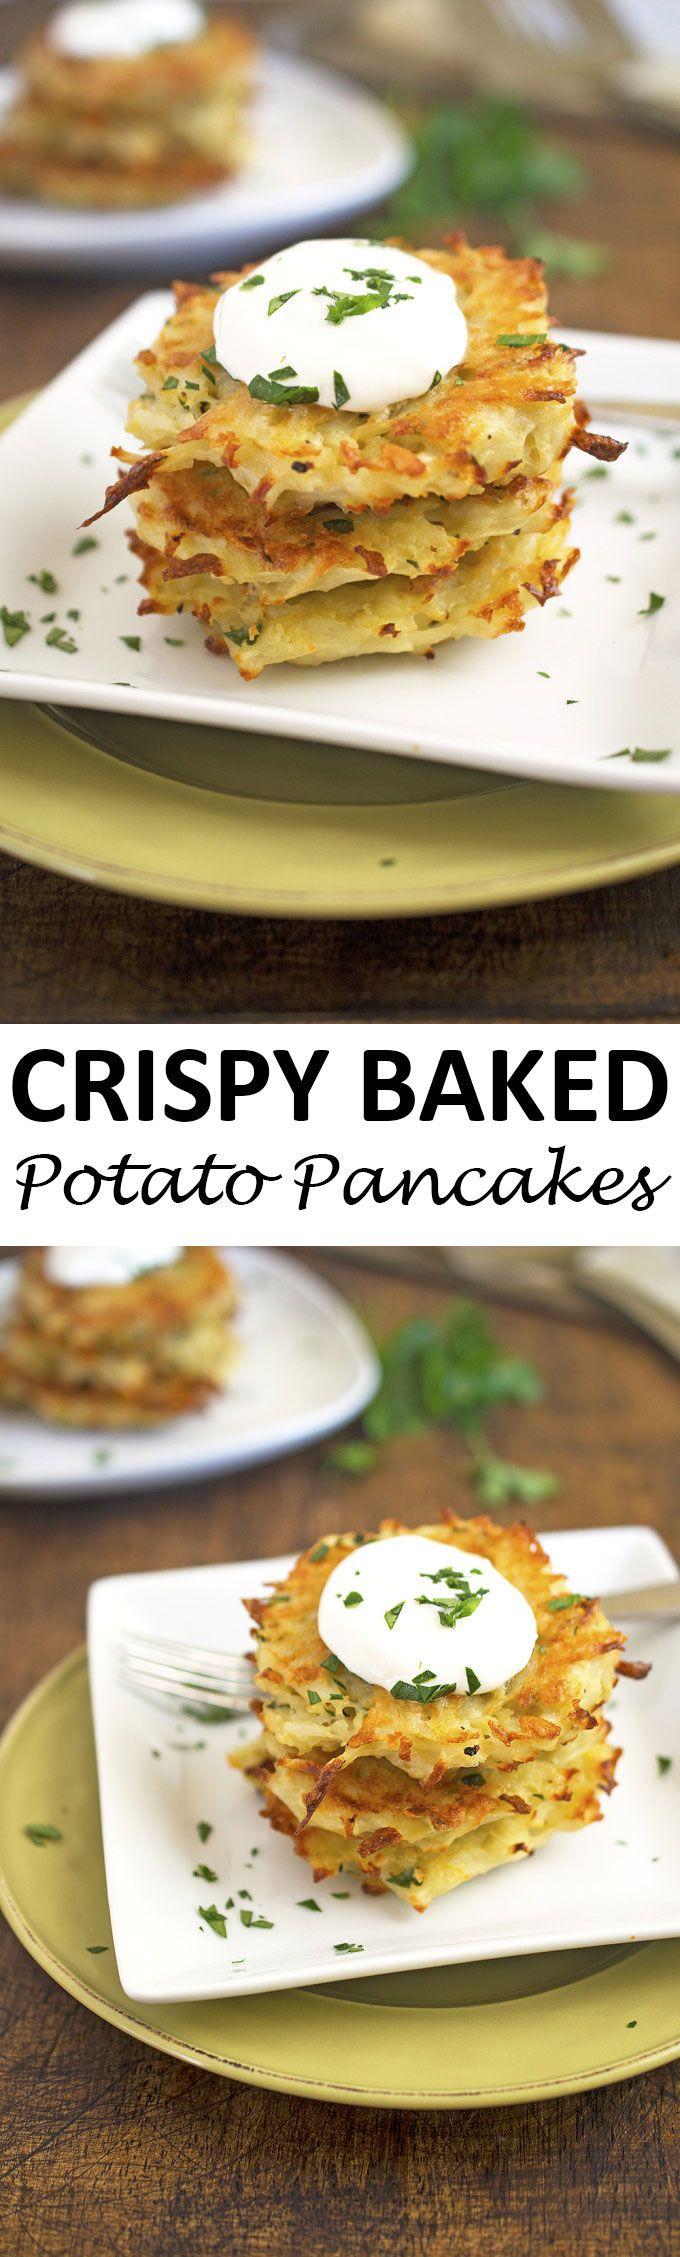 Crispy Baked Potato Pancakes stuffed with shredded potatoes, Parmesan cheese, onion, and garlic. A healthier alternative to fried potato pancakes or latkes. | chefsavvy.com #recipe #appetizer #baked #potatoes